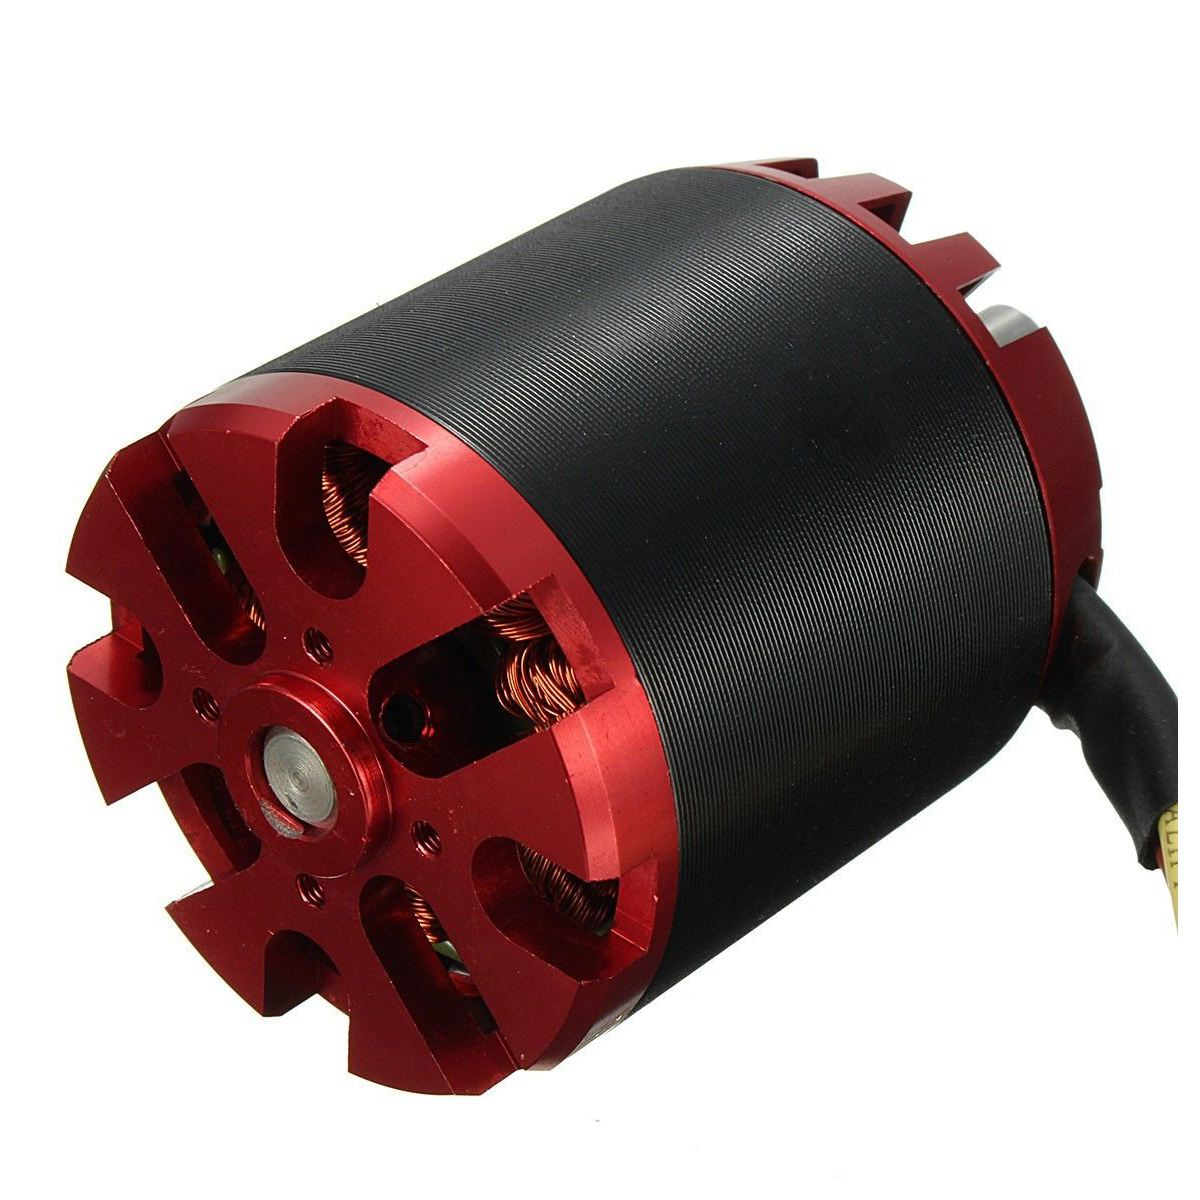 Nuevo sin escobillas Outrunner Motor N5065 320KV para bricolaje eléctrico Skate Kit